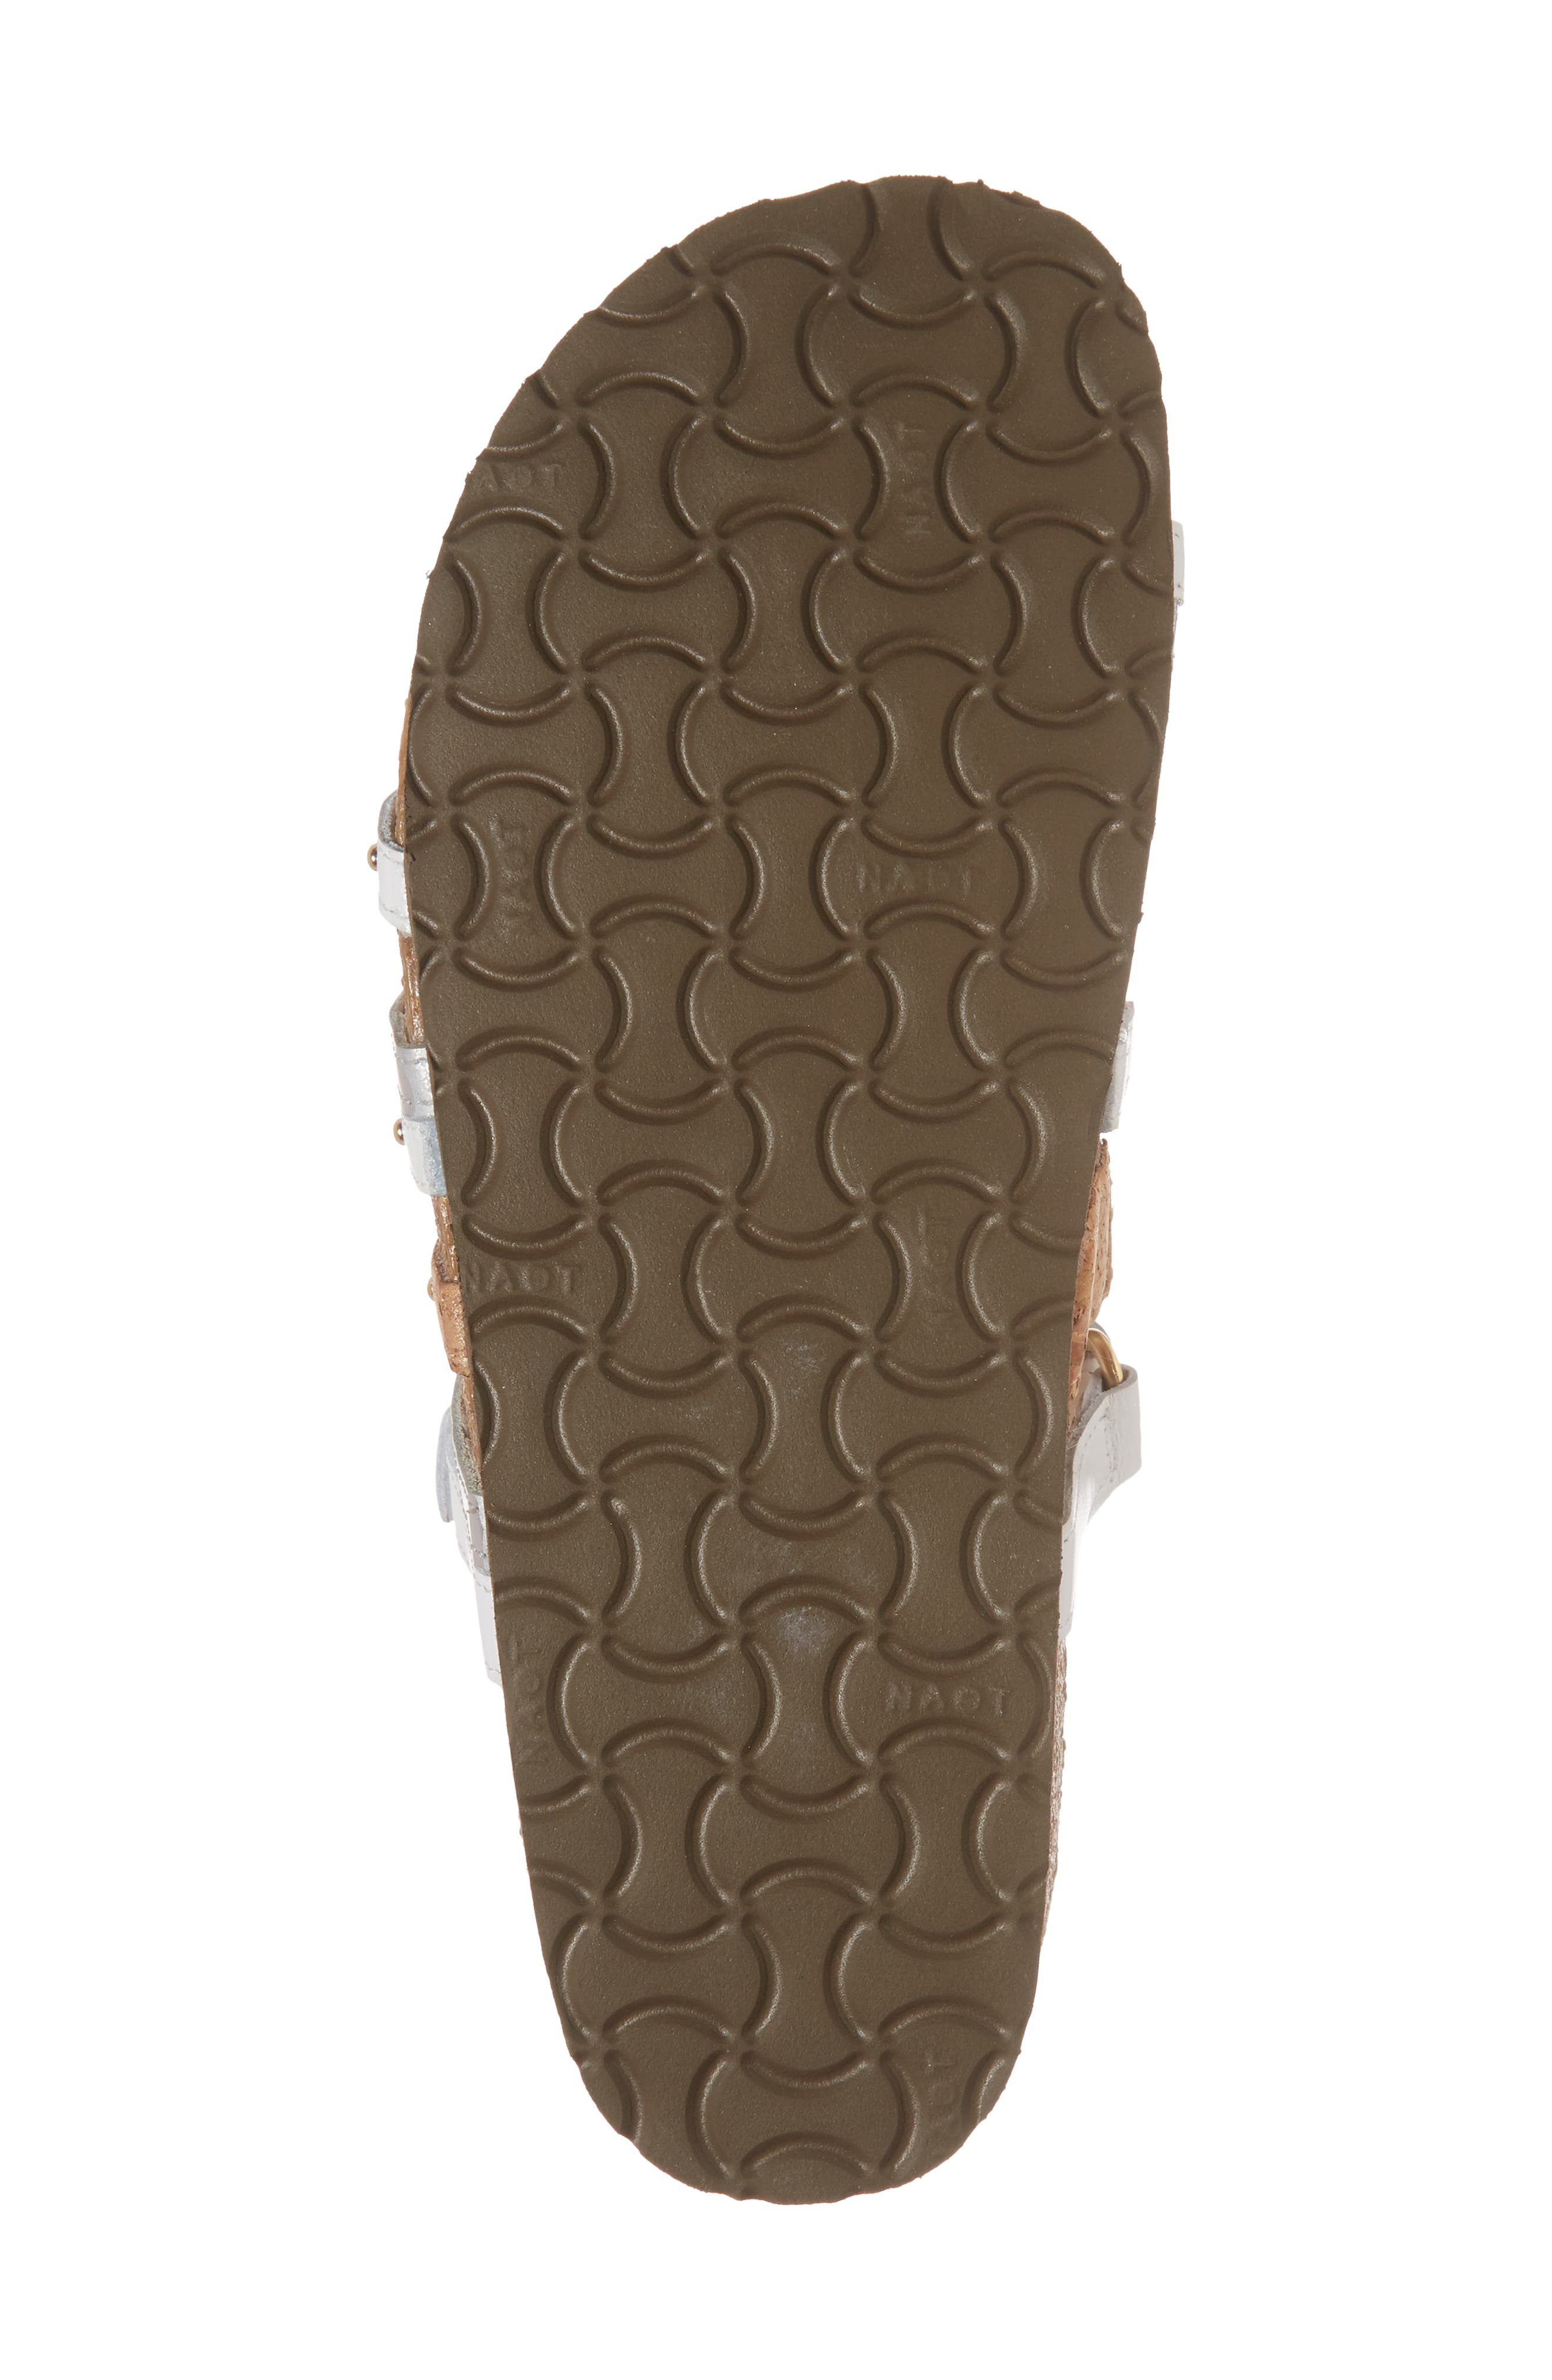 Prescott Sandal,                             Alternate thumbnail 6, color,                             White/ Silver Leather